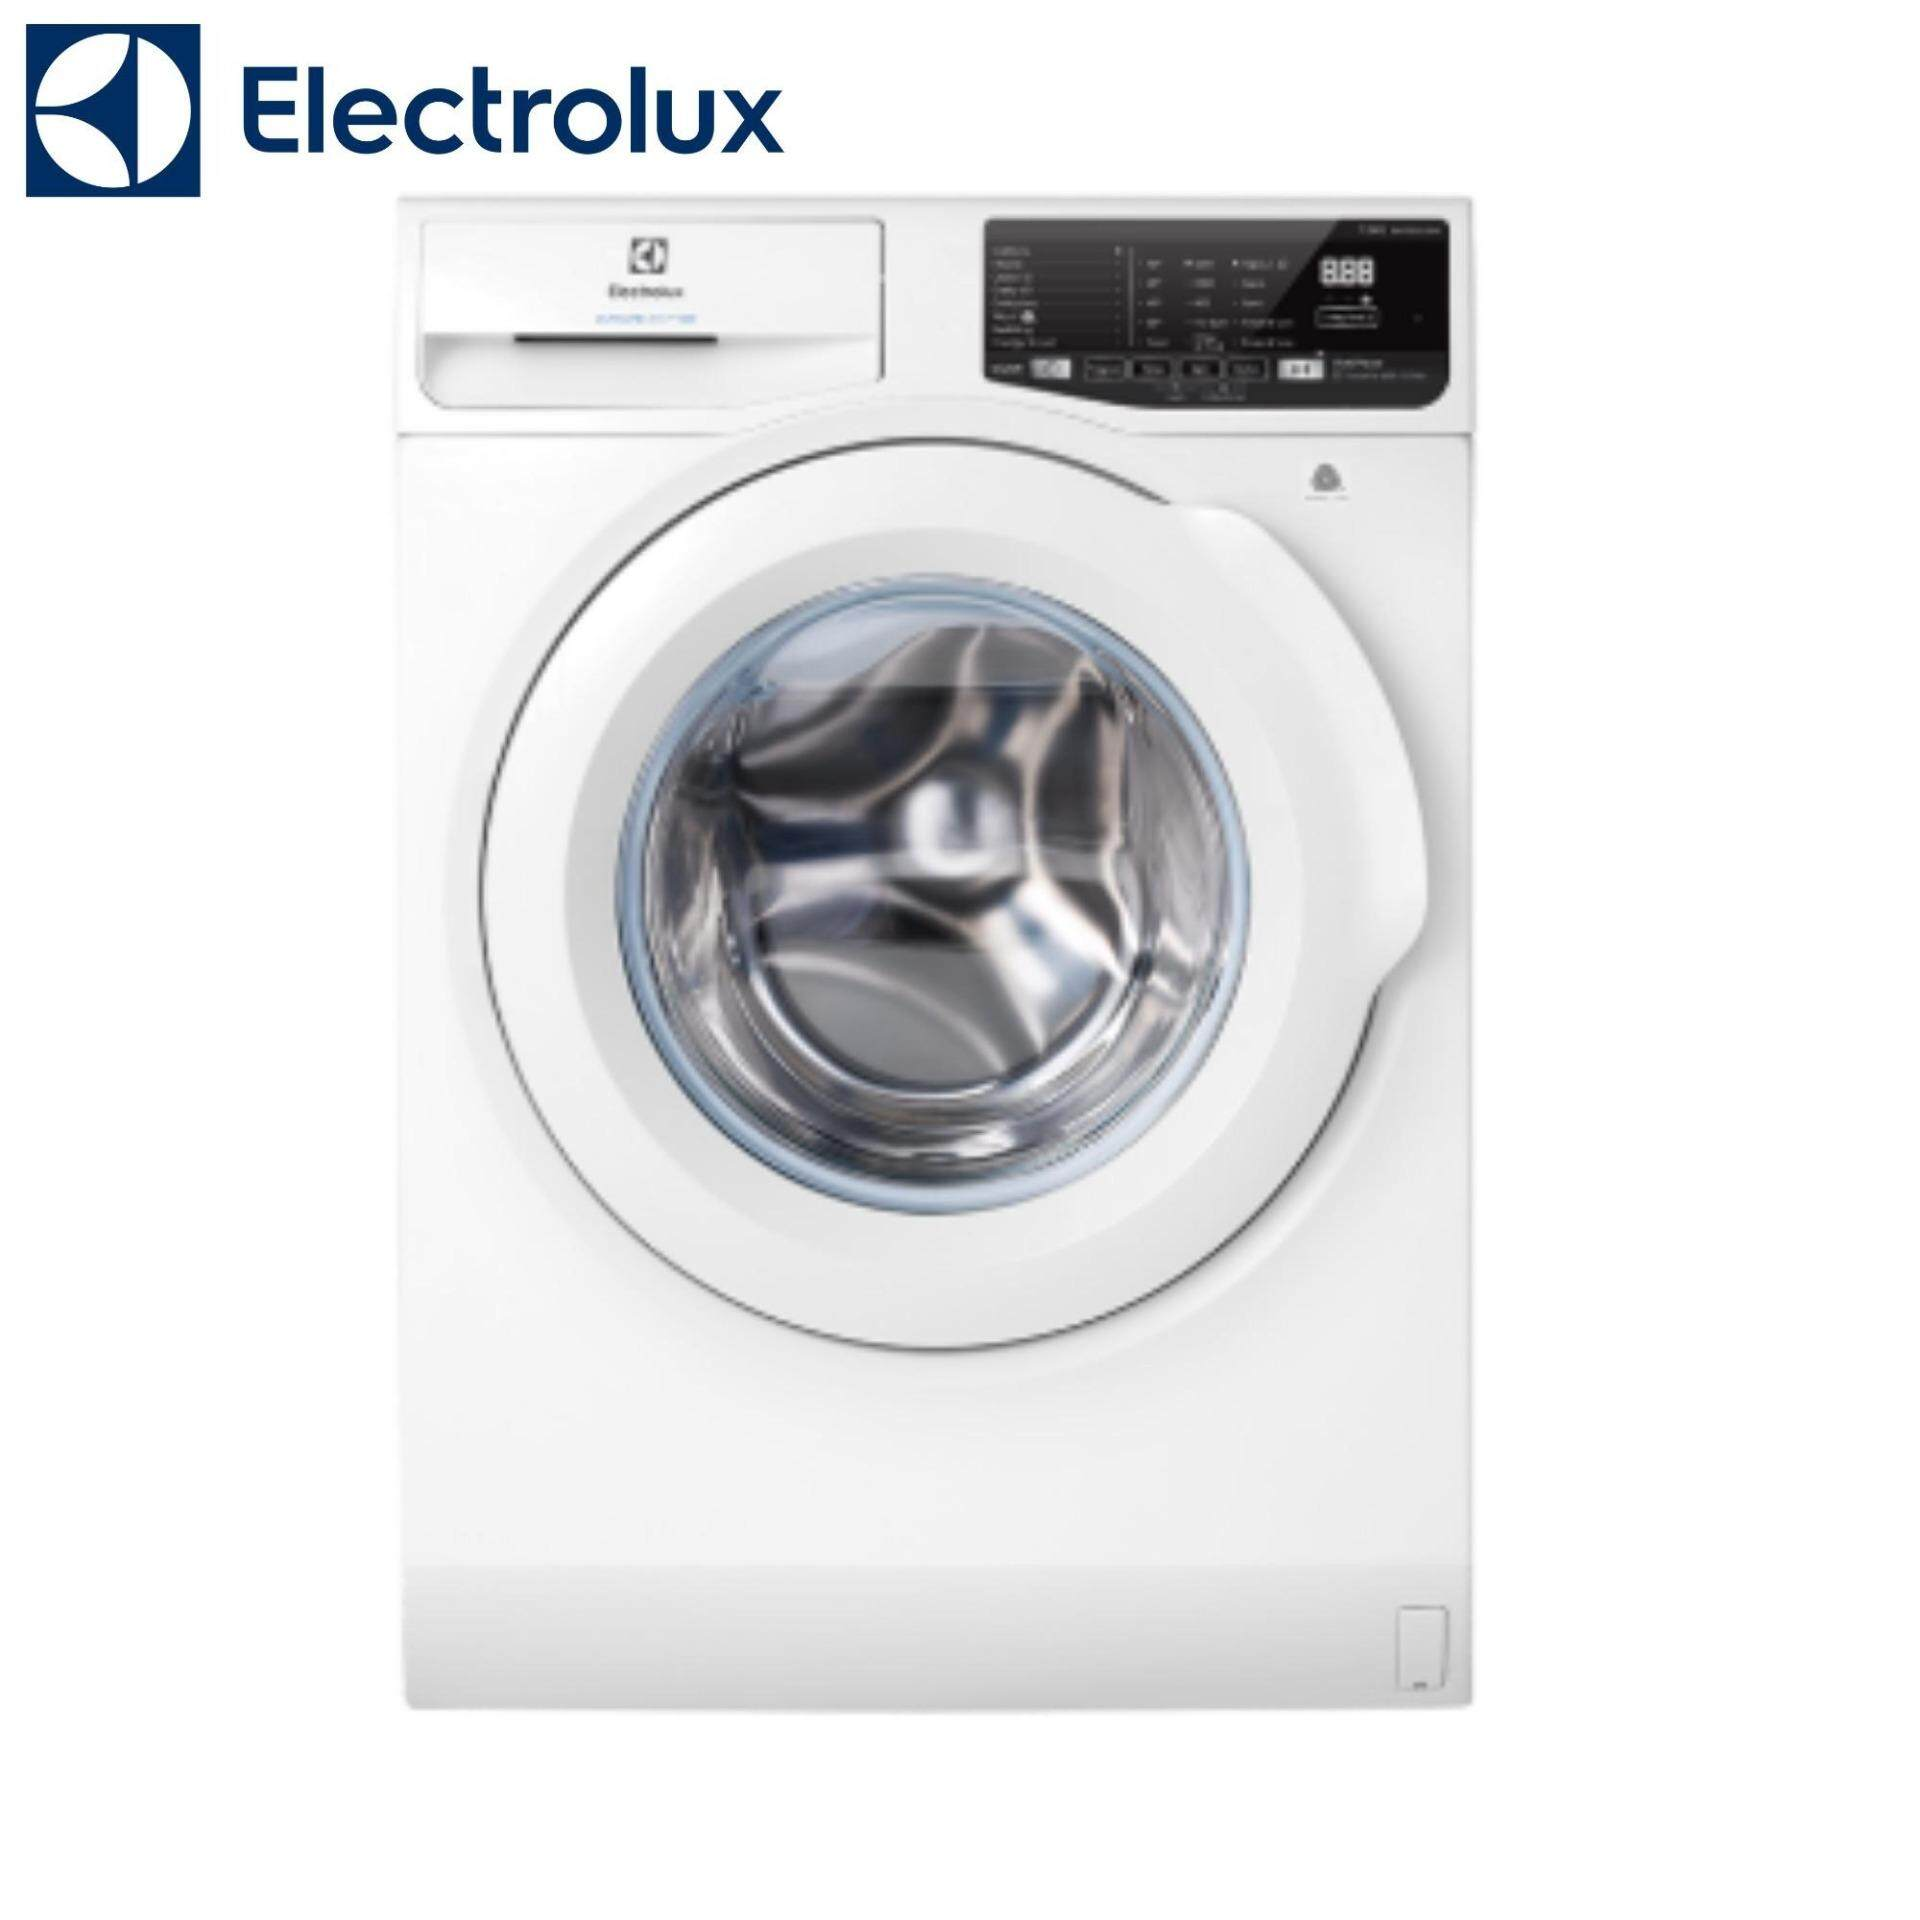 Electrolux Washing Machine Ewf7525eqwa 7.5kg Washer By Lazada Retail Tech-Mall.